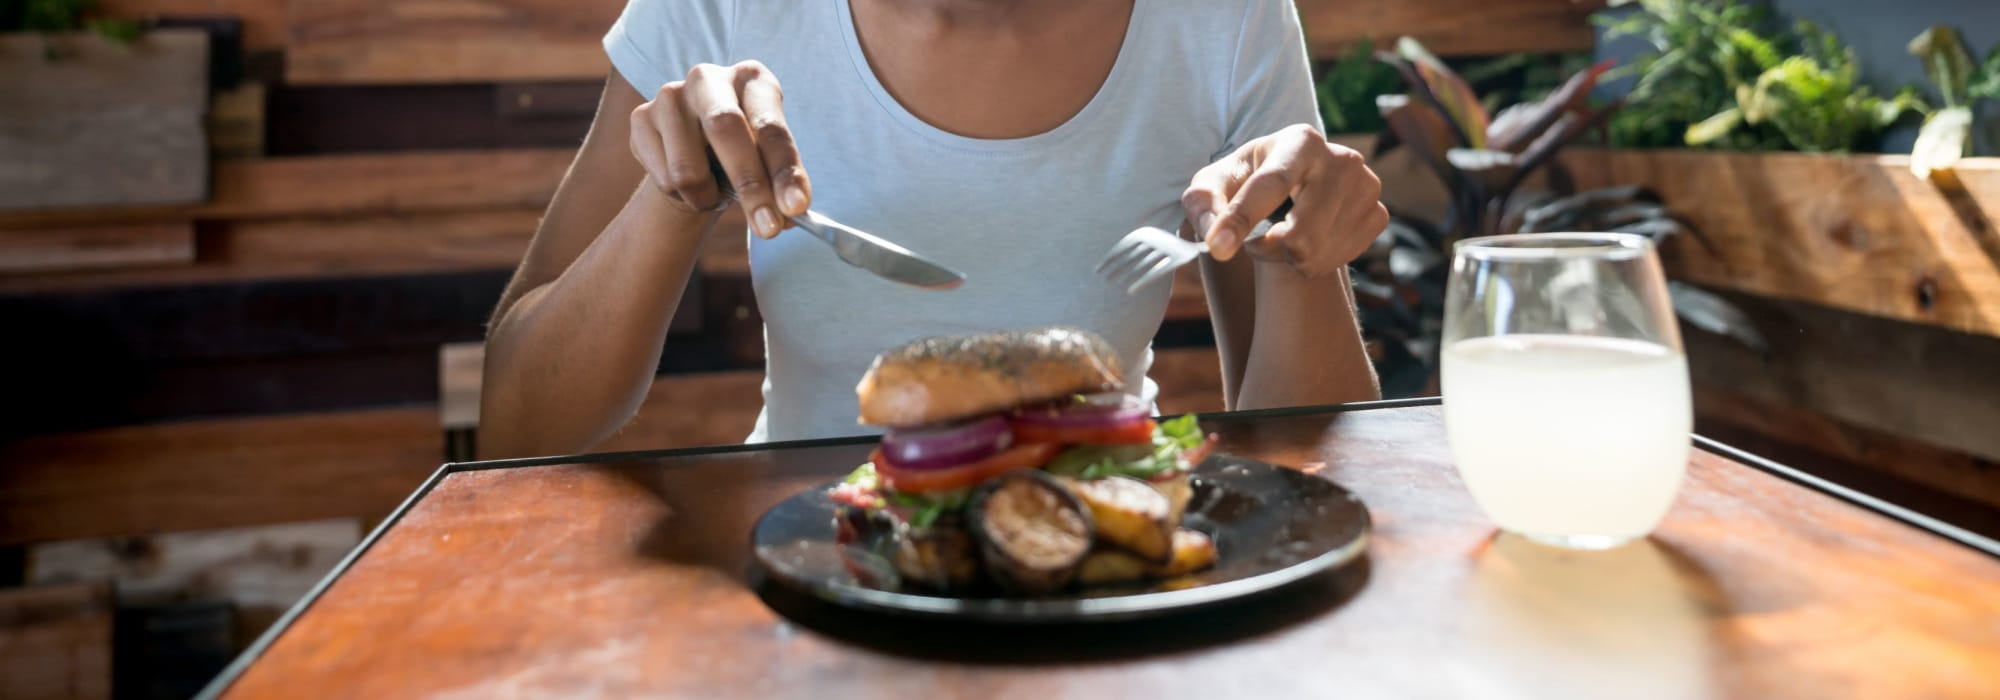 Resident enjoying a burger near San Artes in Scottsdale, Arizona